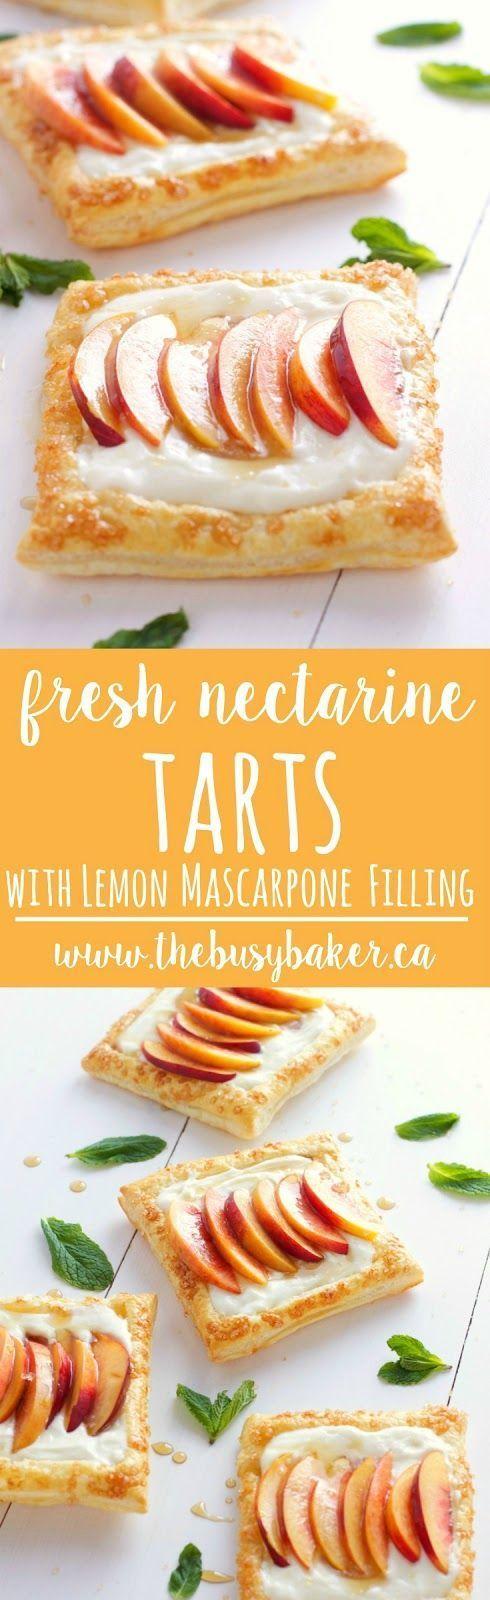 Fresh Nectarine Tarts with Lemon Mascarpone Filling http://www.thebusybaker.ca